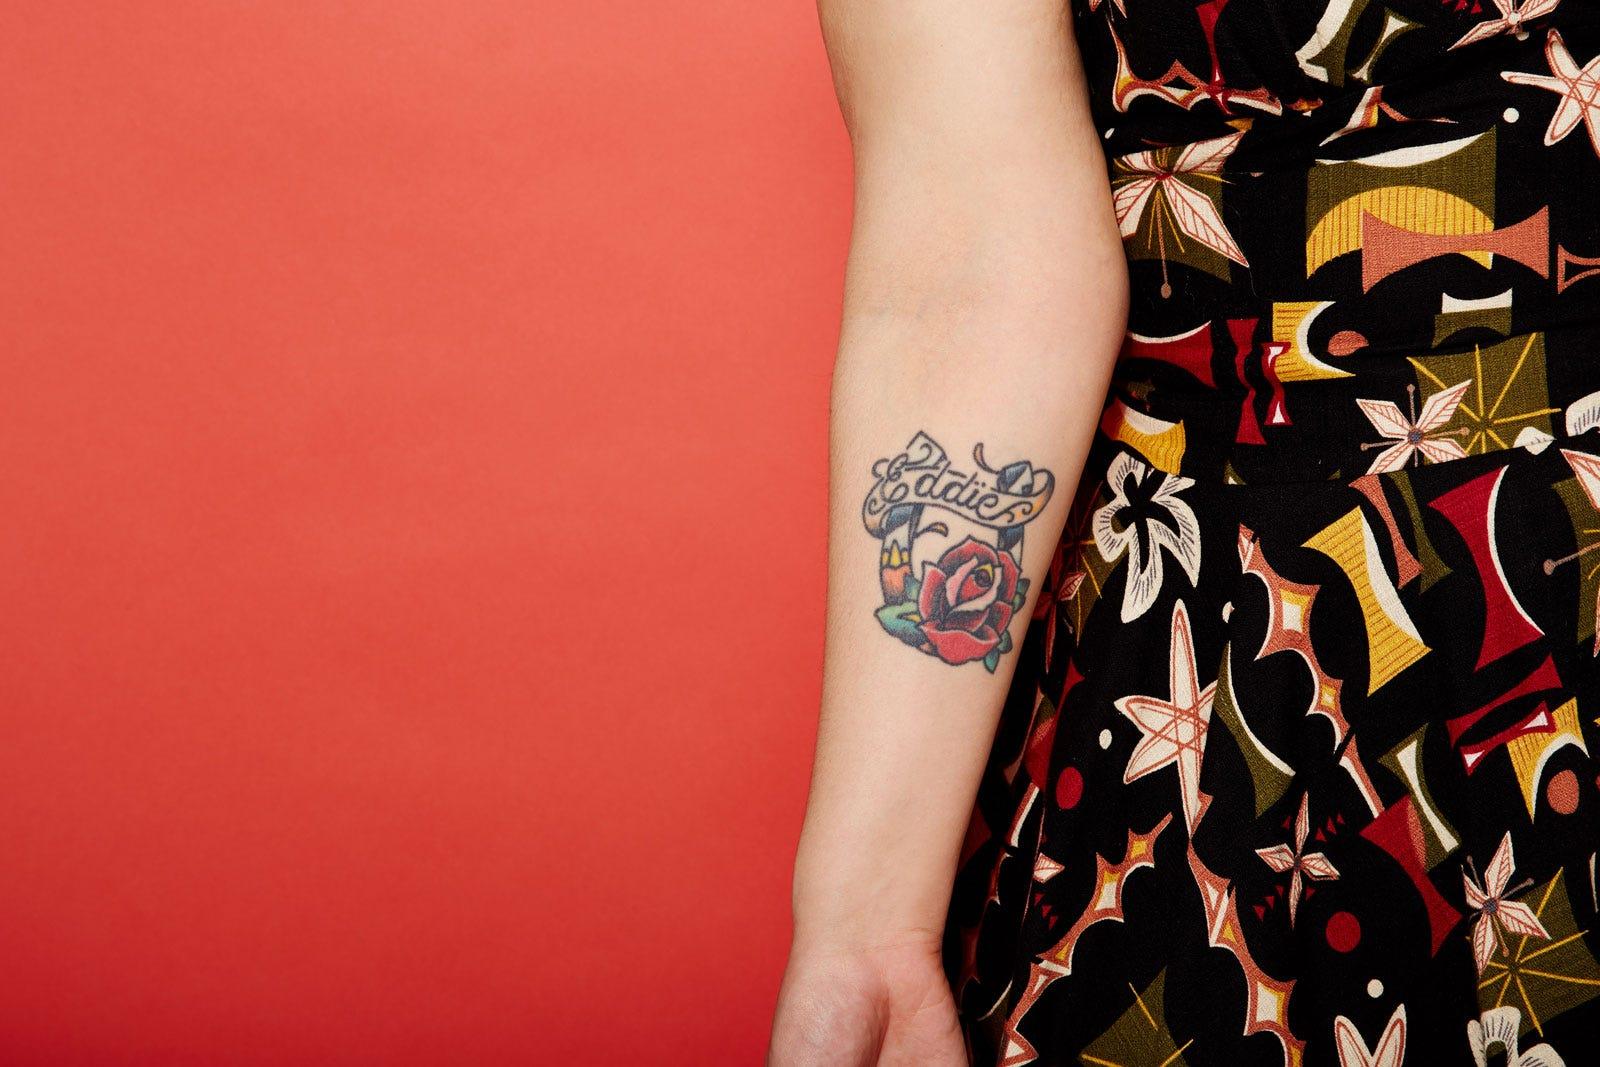 6406e36f Coolest Tattoos - Body Art Design Ideas, Photos